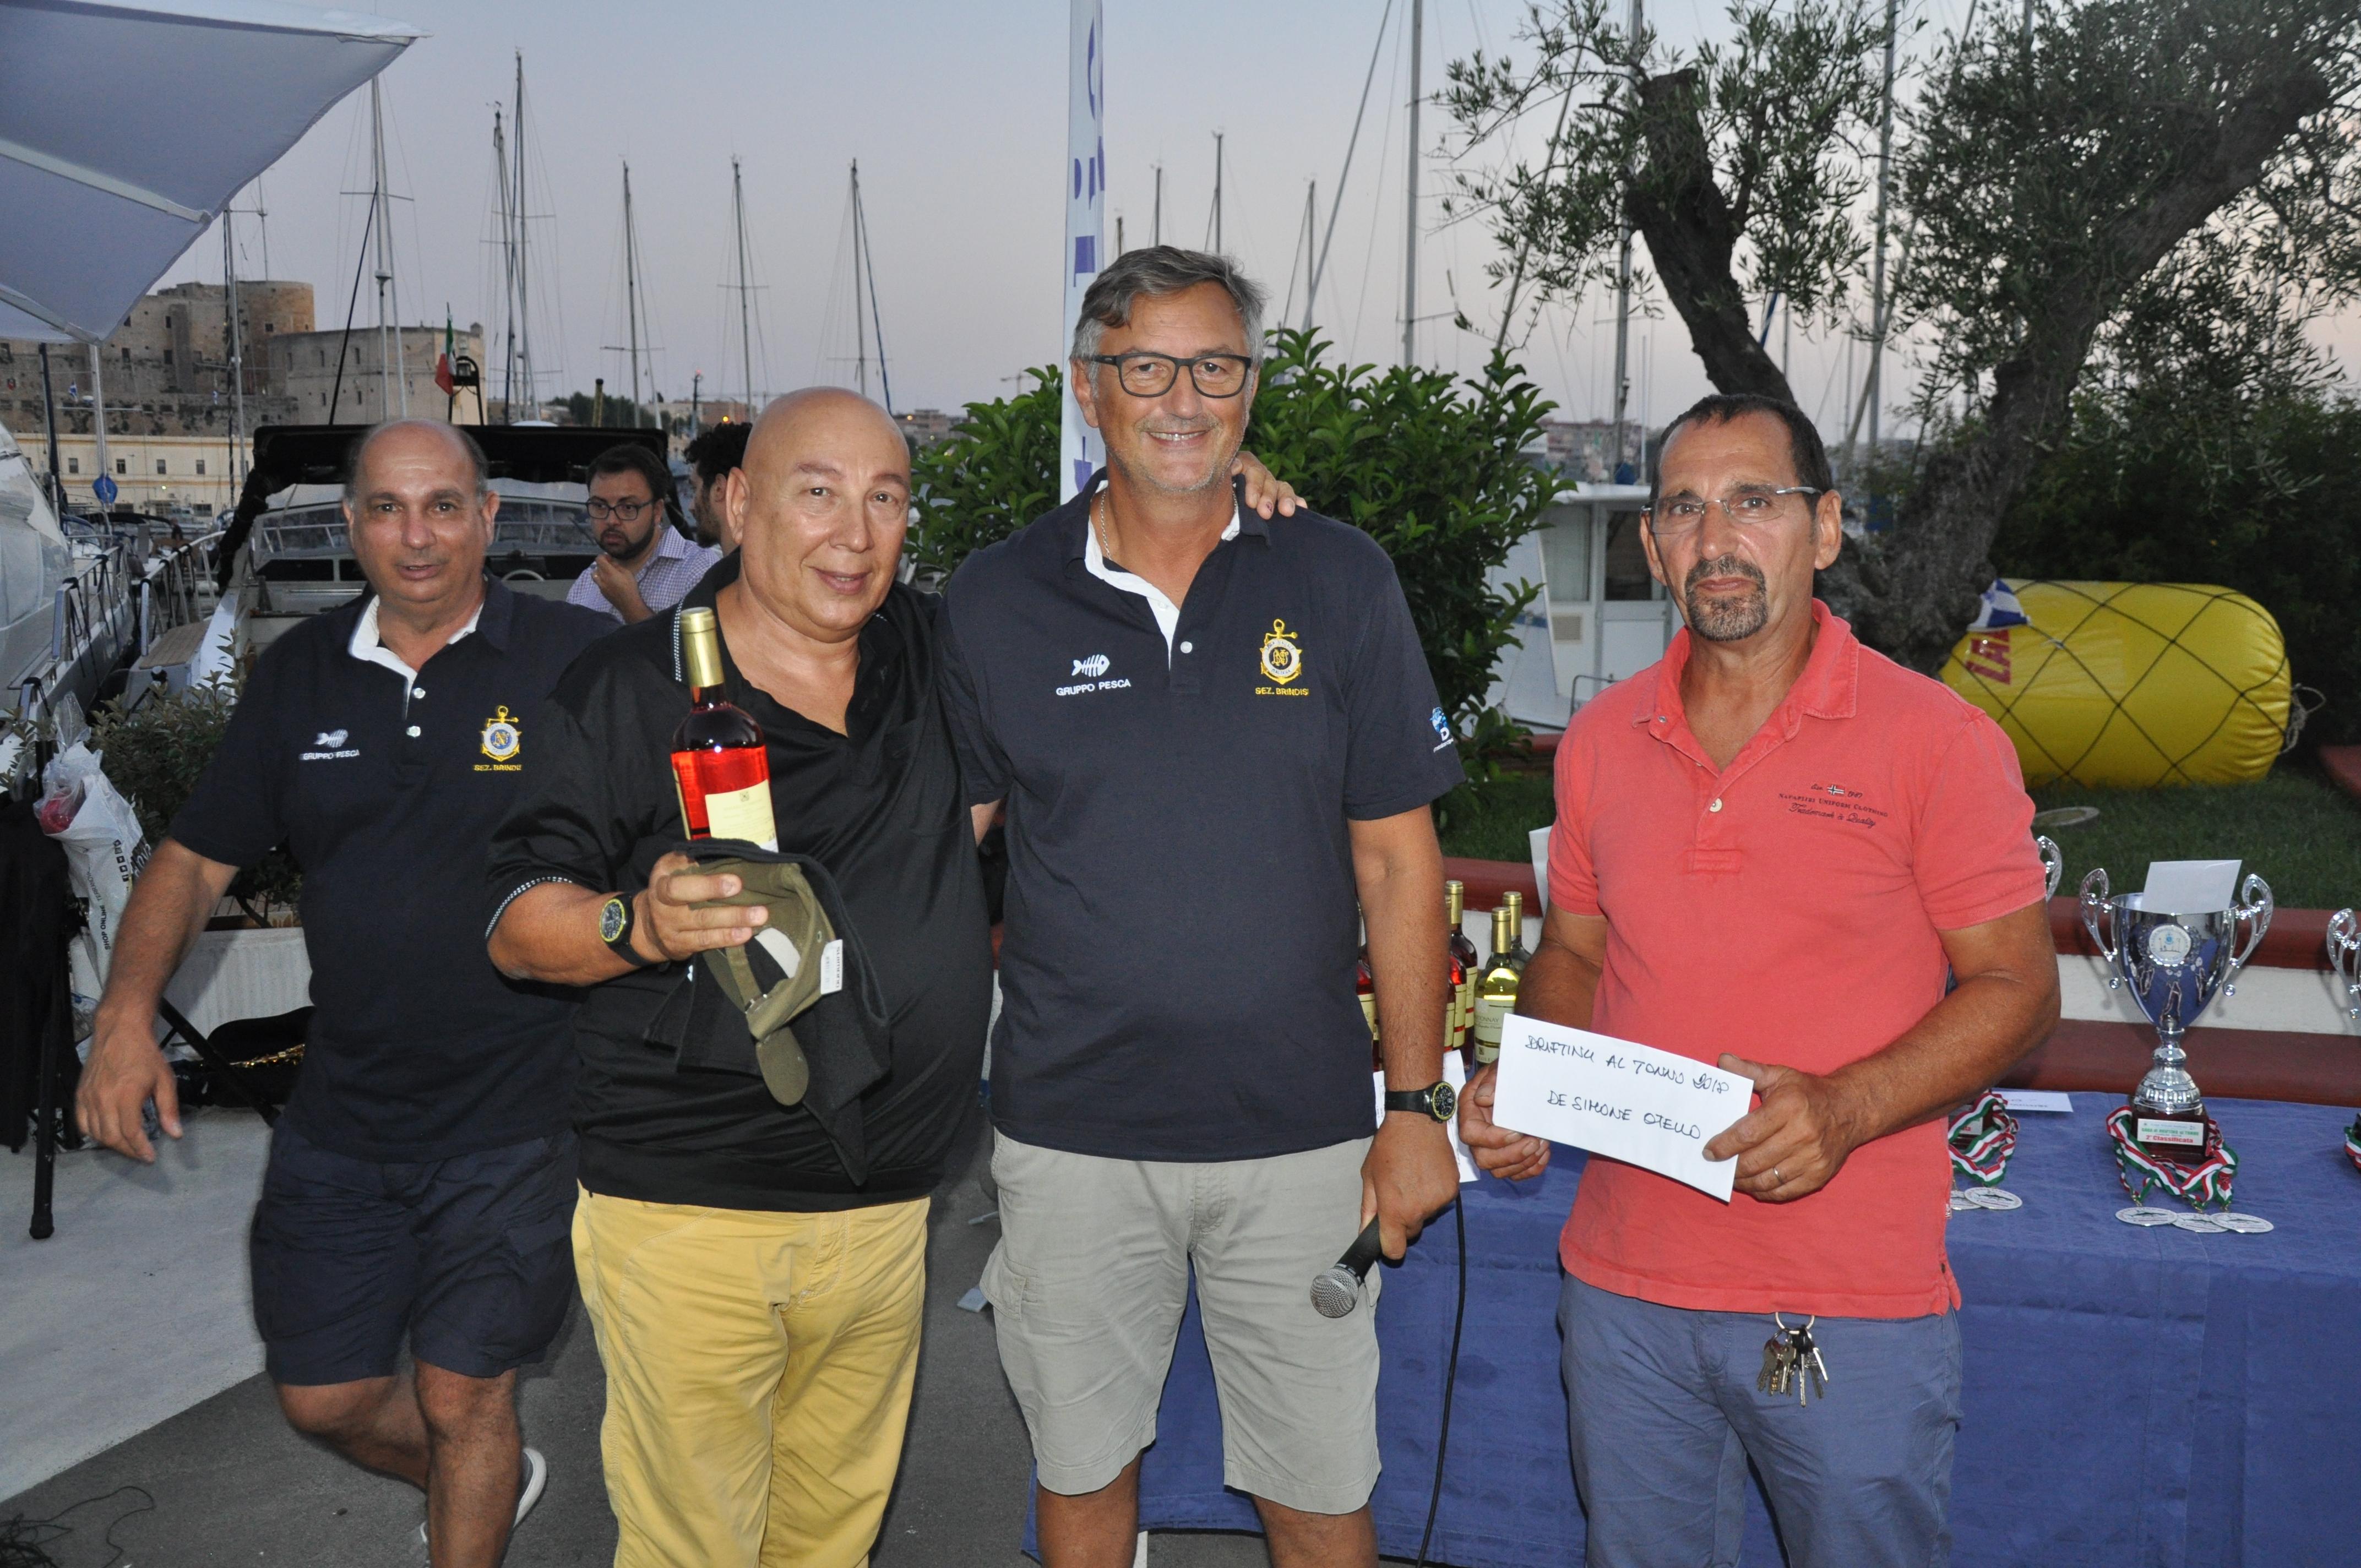 premiazione drifting al tonno 2018 (8)